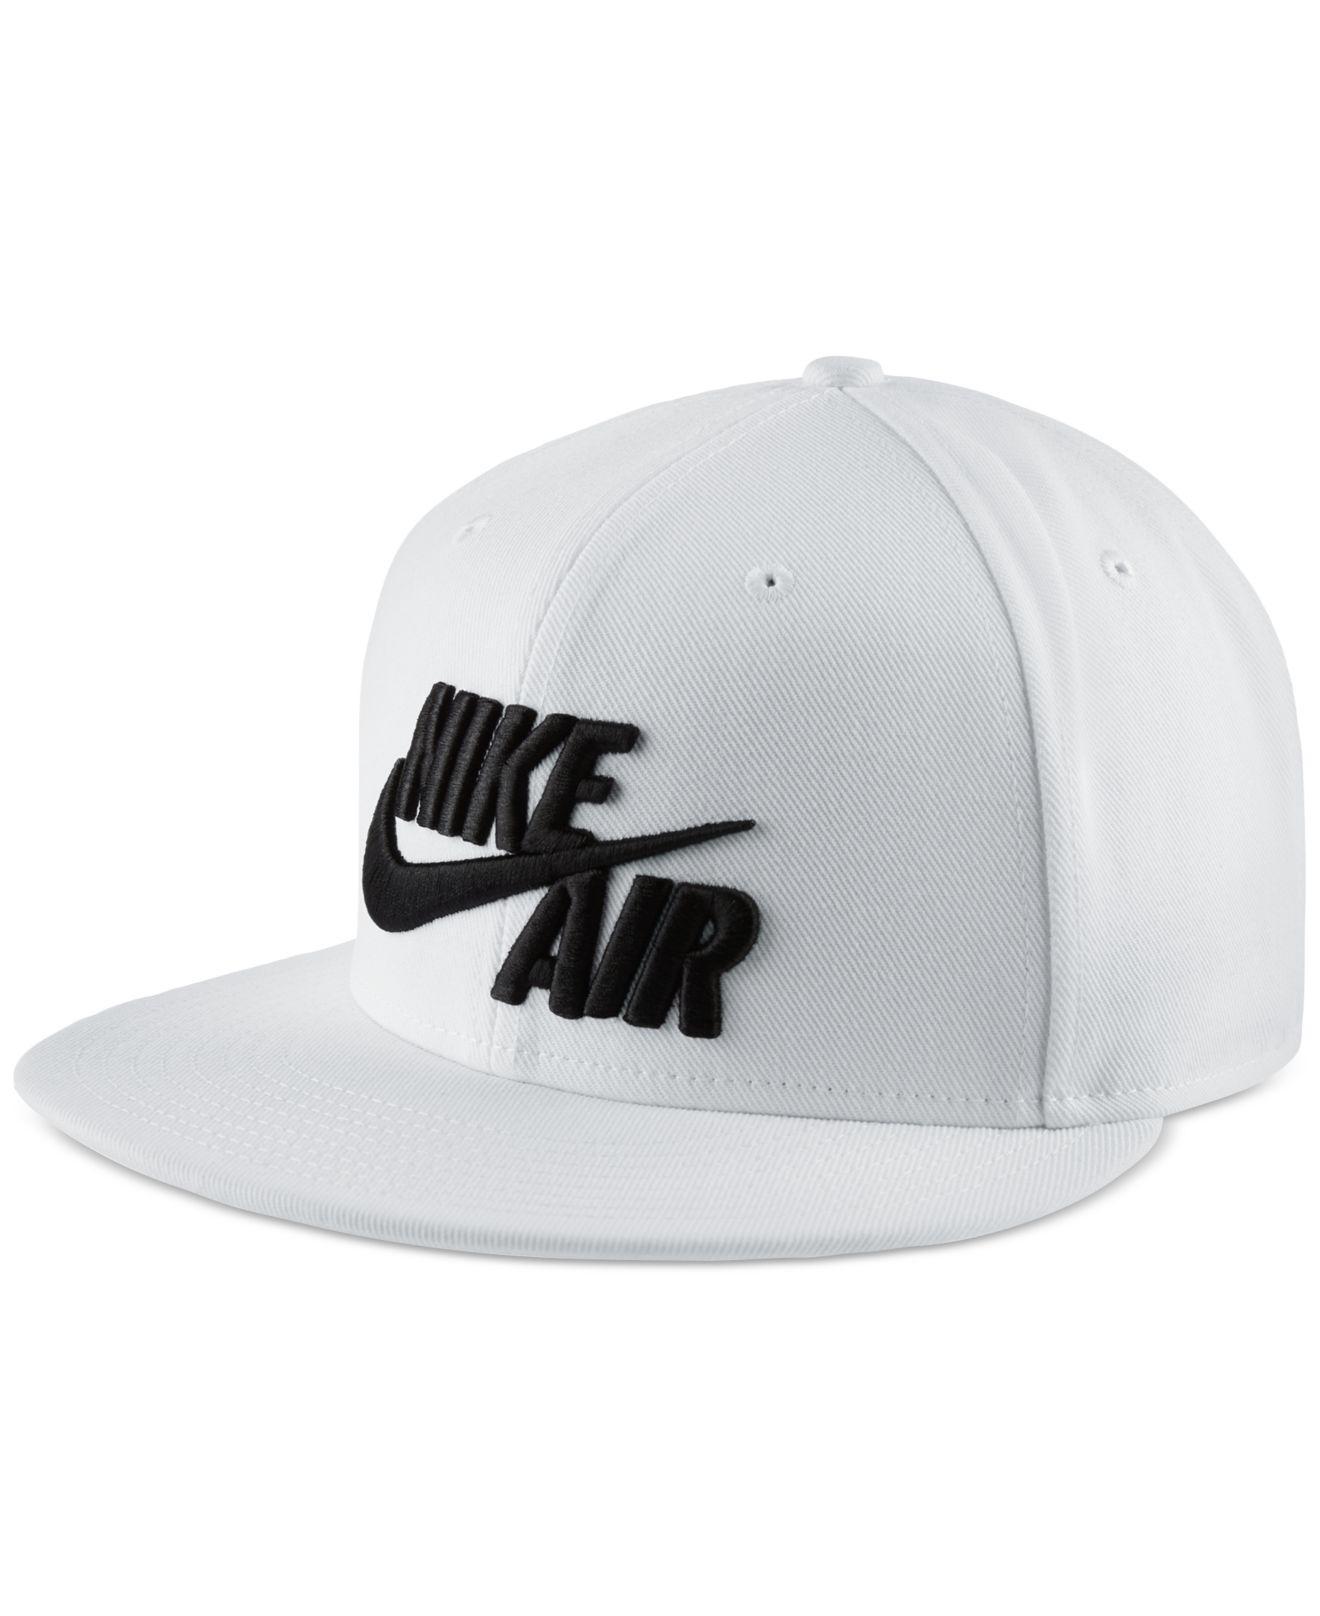 99f4a8756ad Lyst - Nike Sportswear Air Dri-fit Hat in White for Men